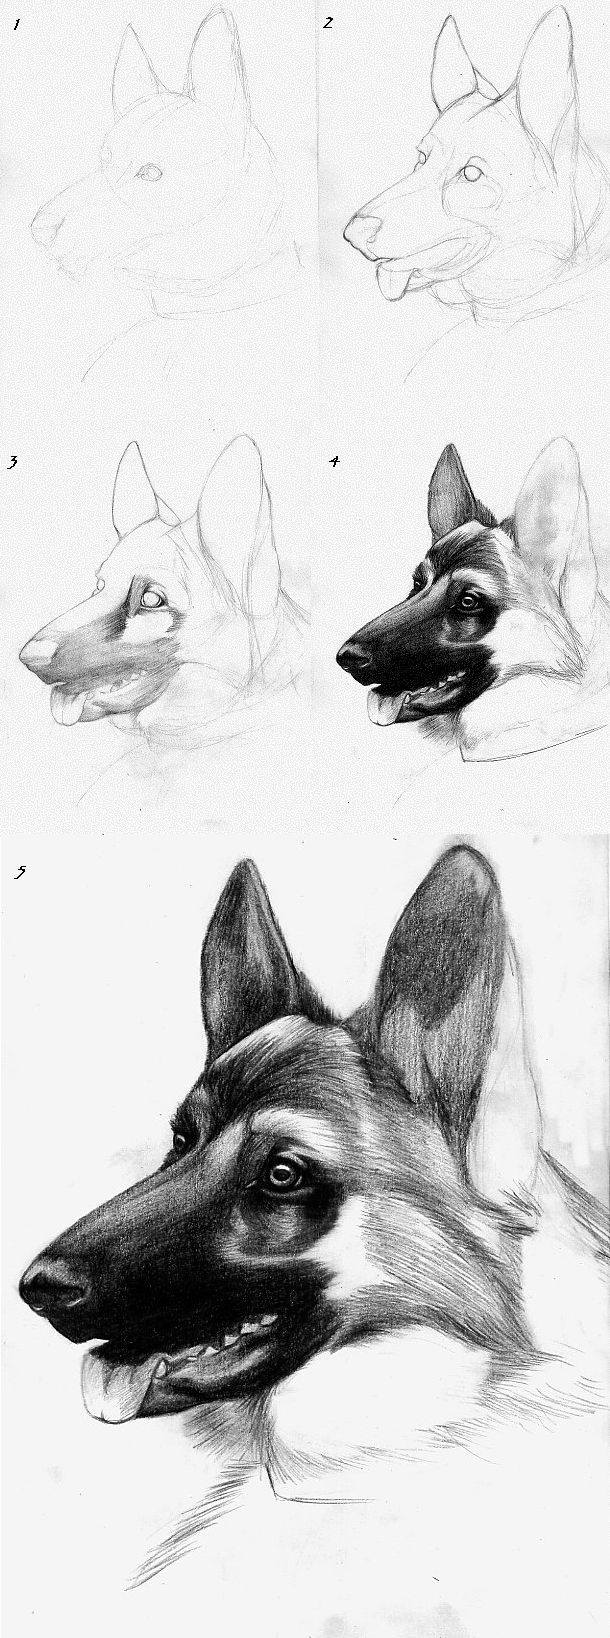 Canine Drawing Tutorial - GS by roseofaurora.deviantart.com on @deviantART